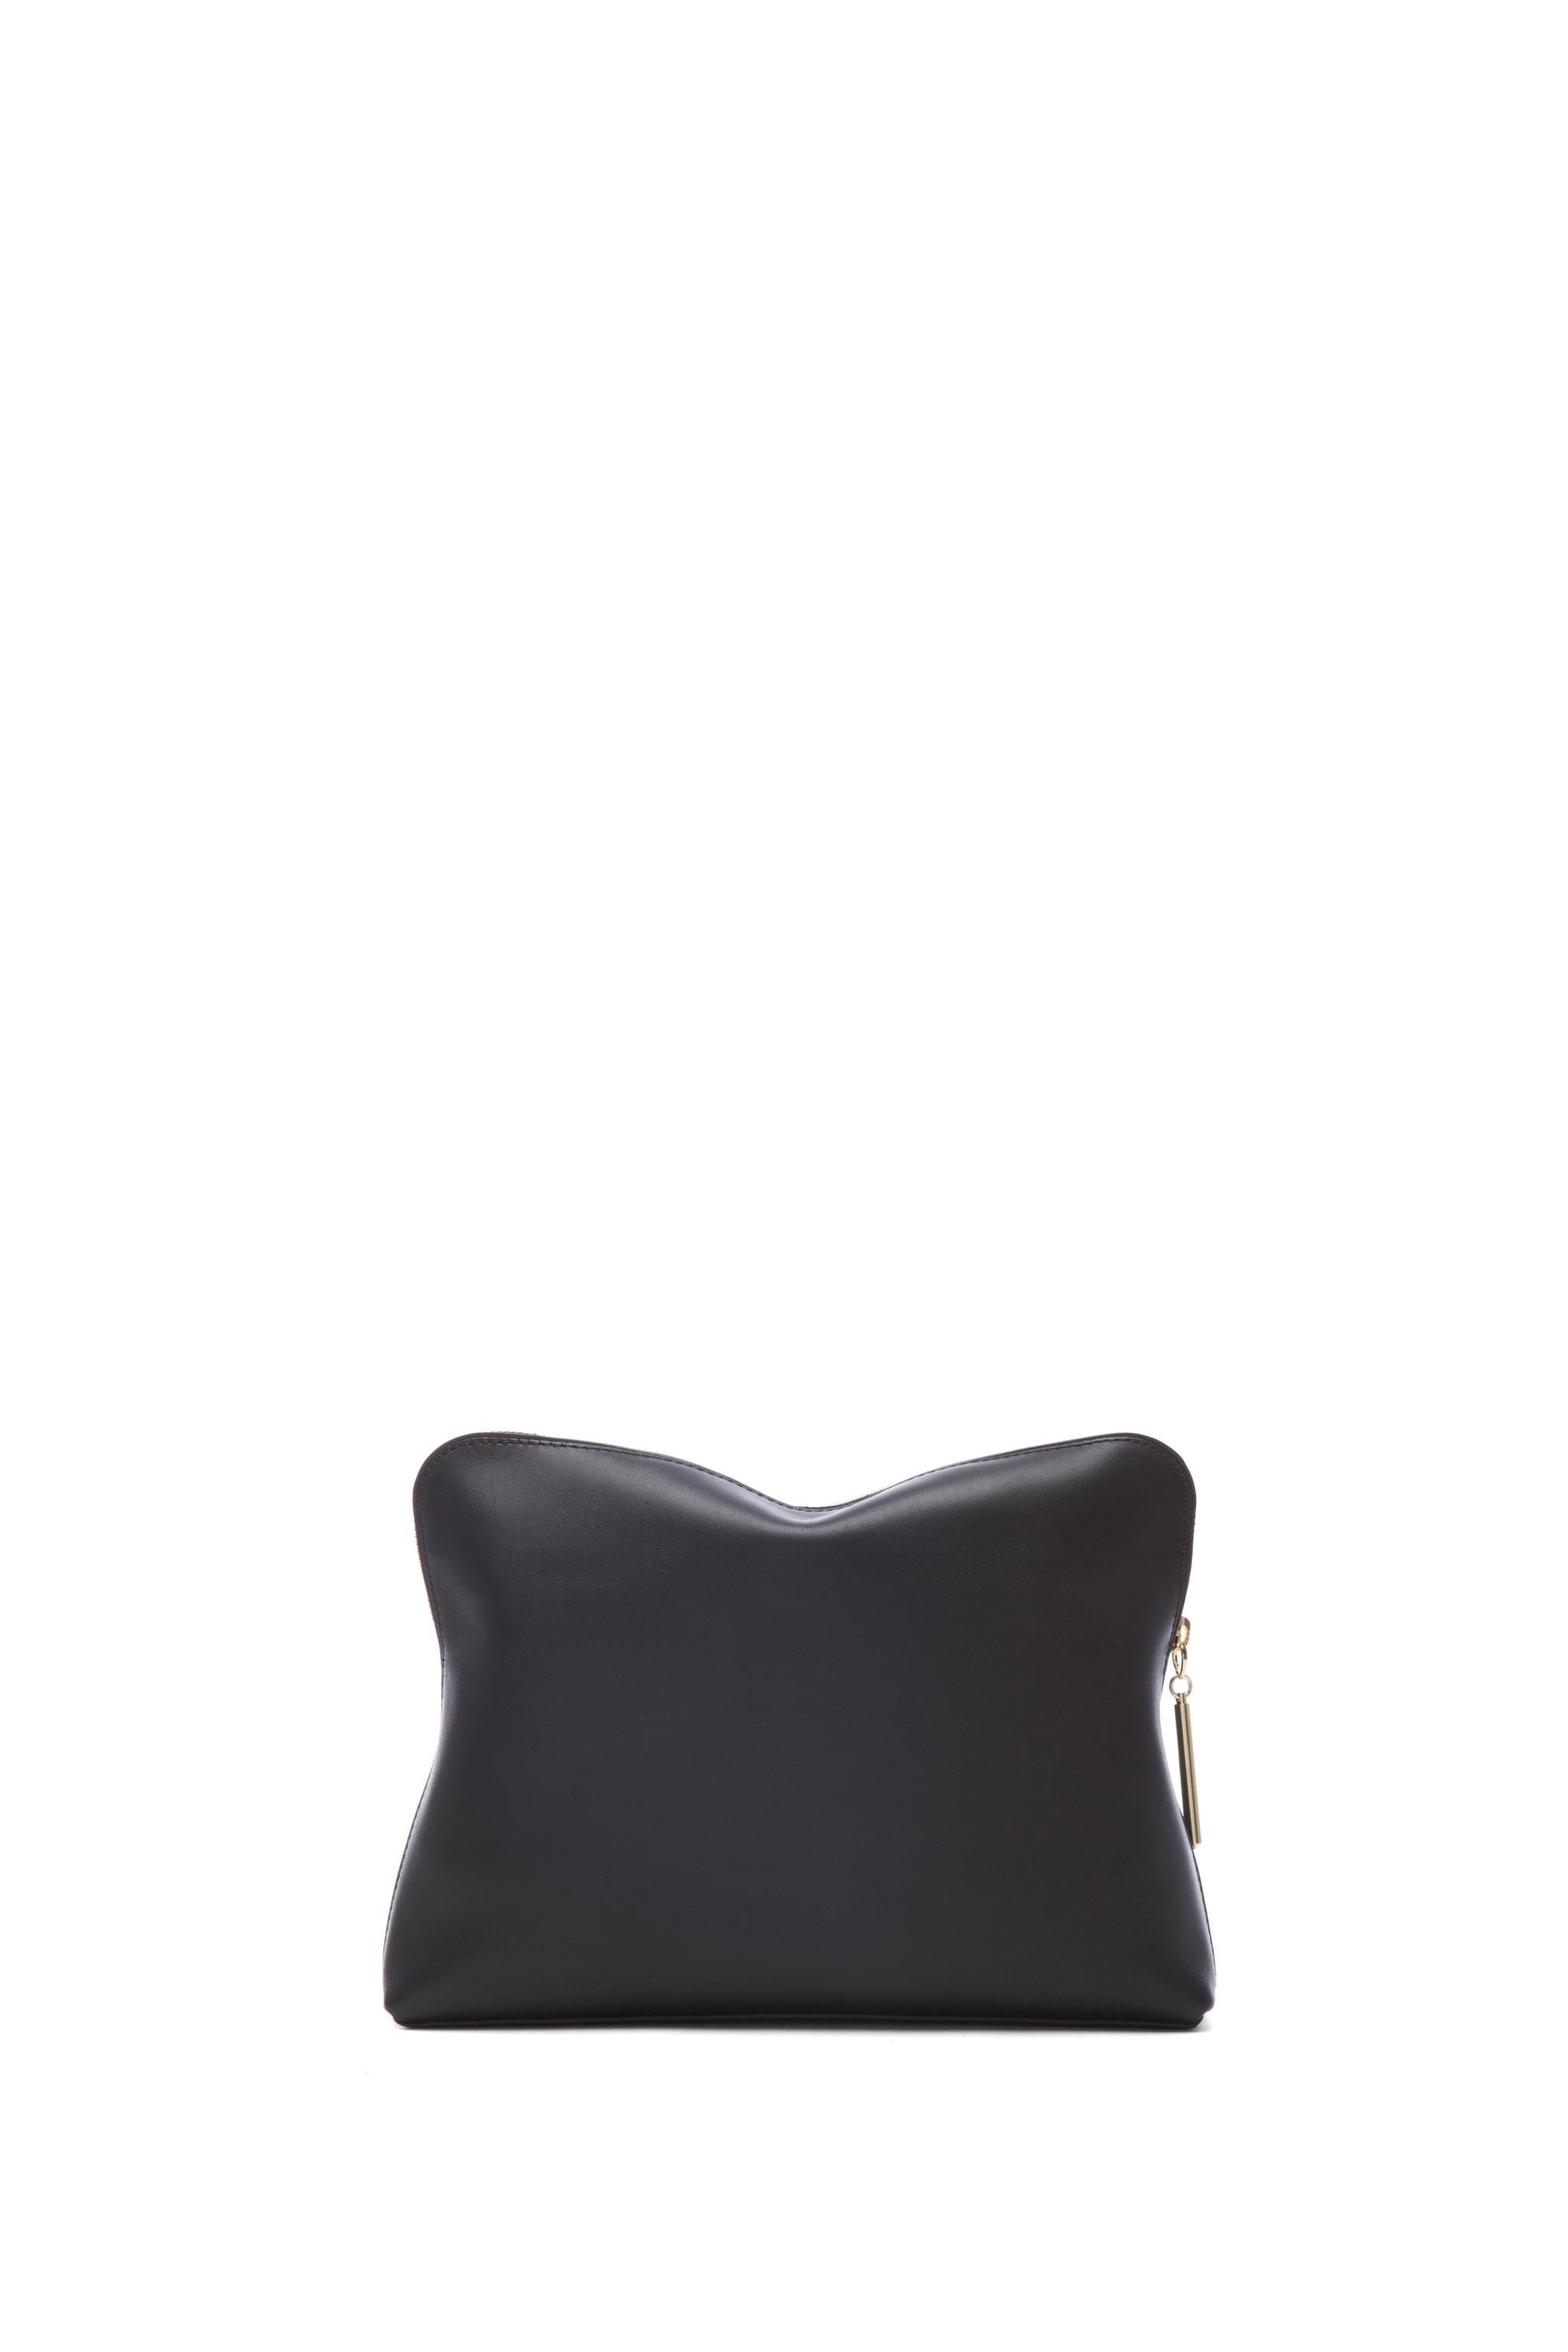 3.1 phillip lim|31 Minute Cosmetic Bag in Black & Polka Dots